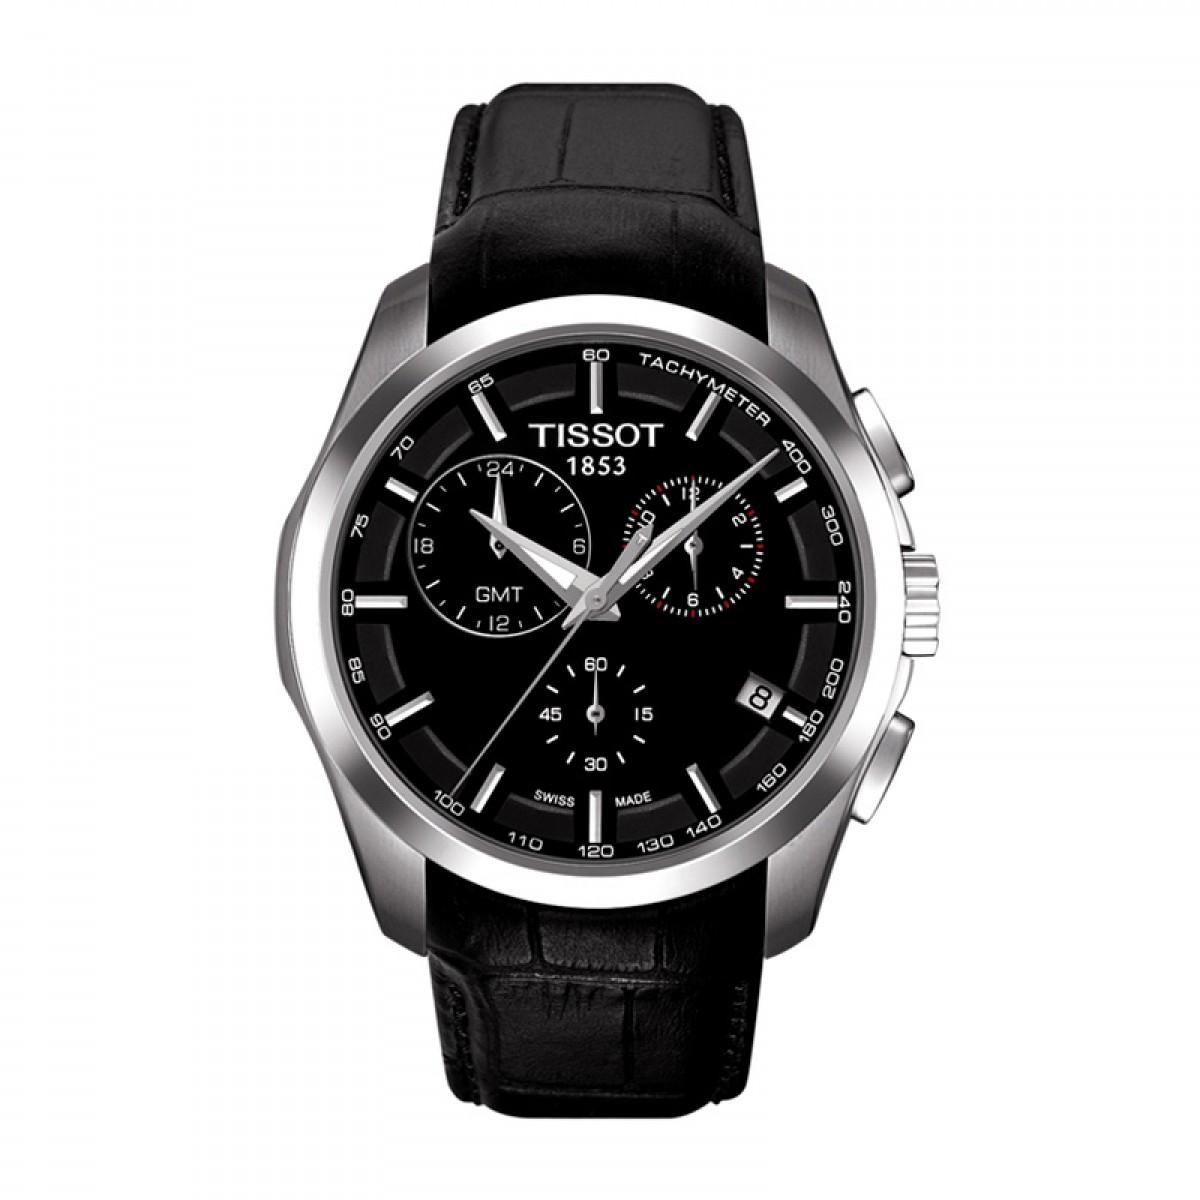 Часовник Tissot T035.439.16.051.00